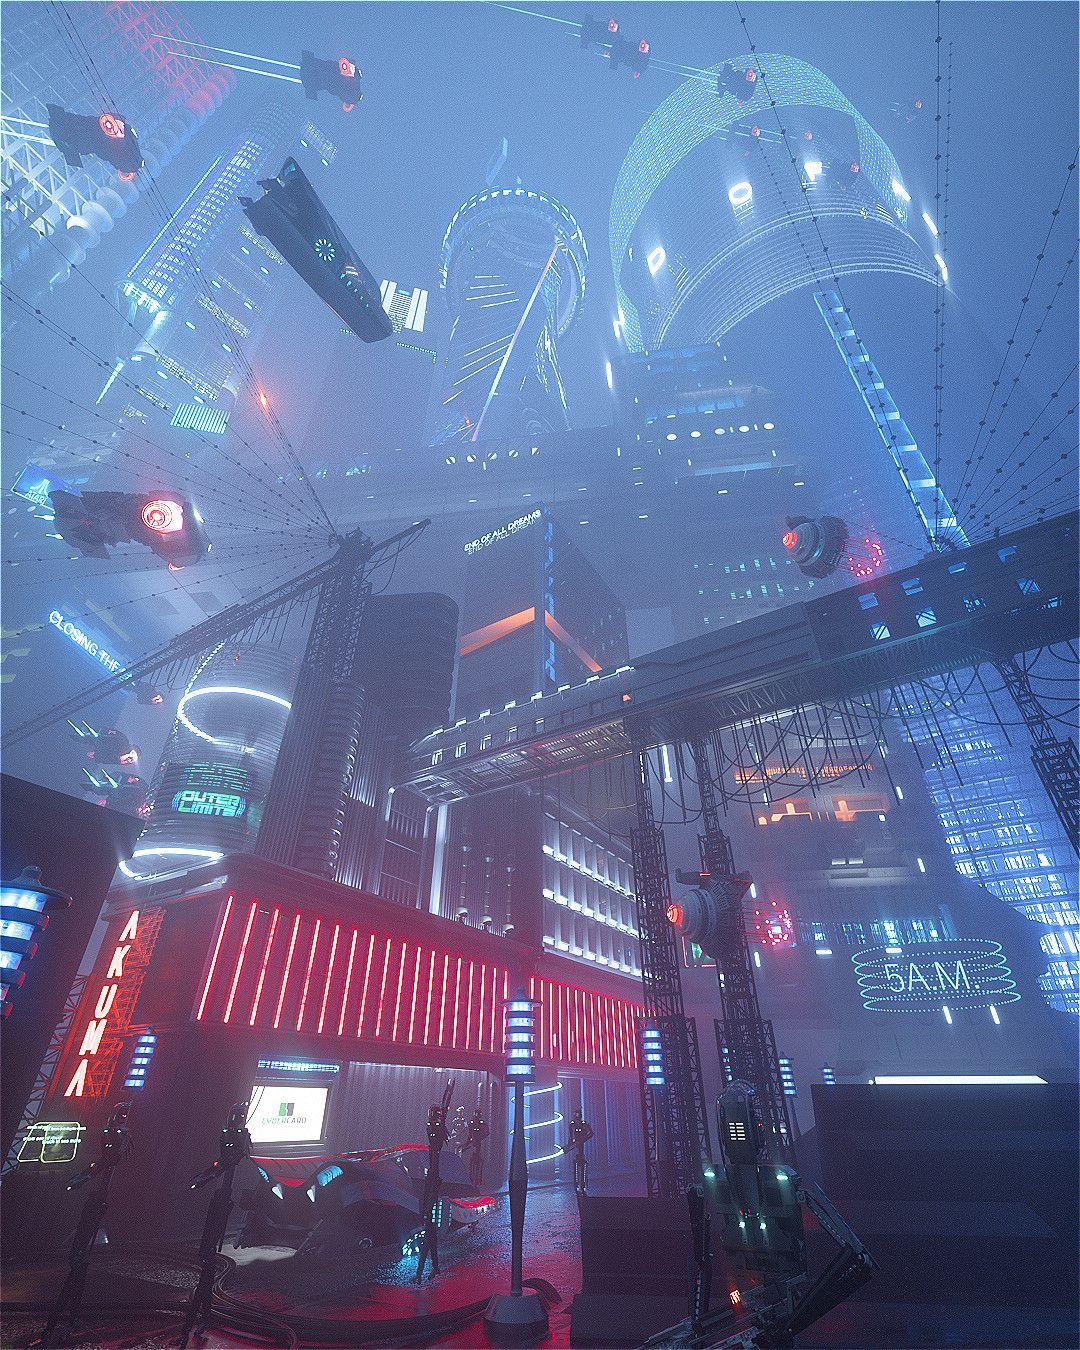 Cyberpunk Urban City Street Environment Landscape